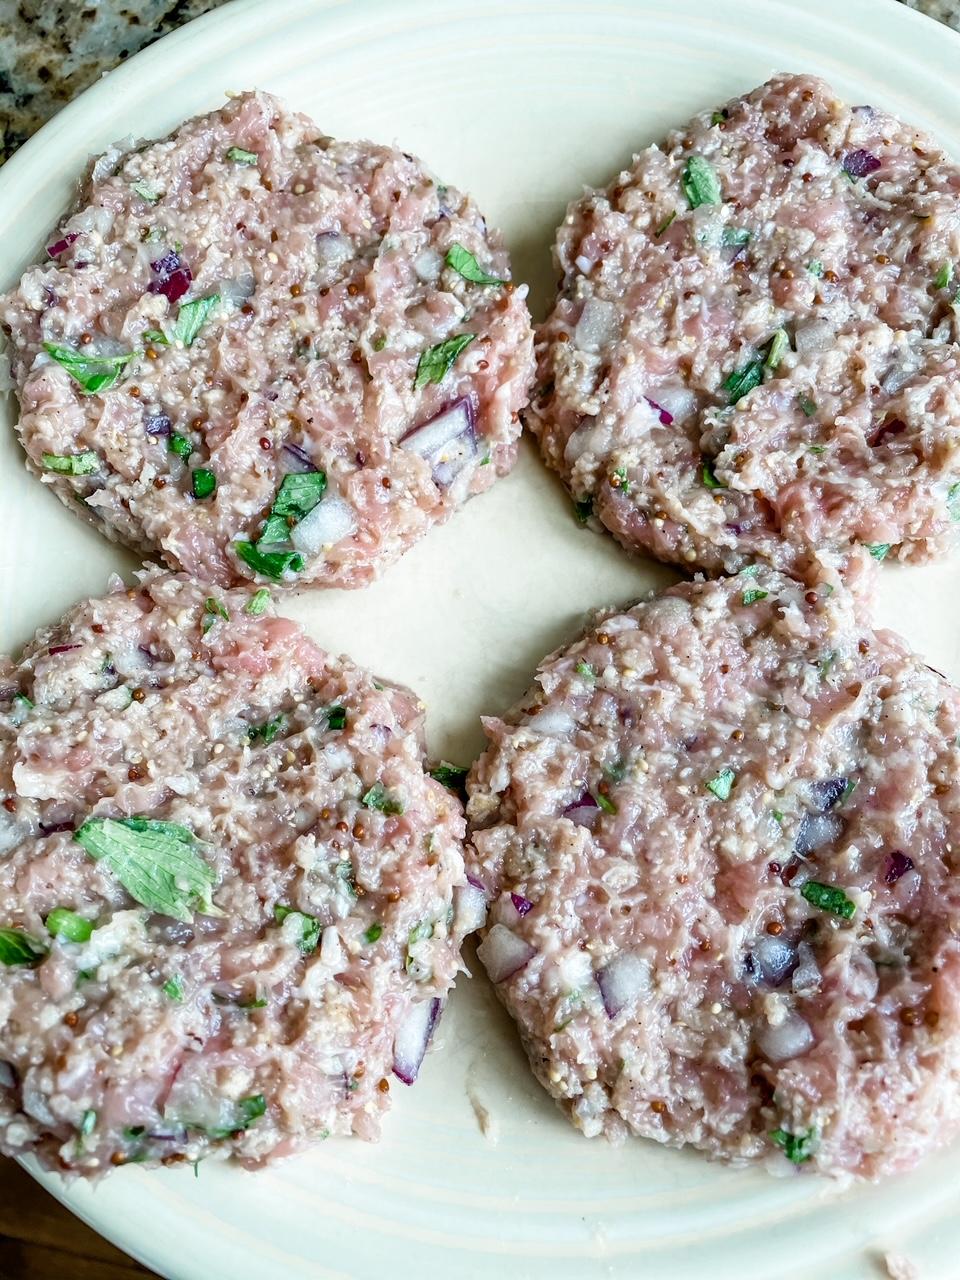 4 Chicken Rueben Burgers patties on a plate